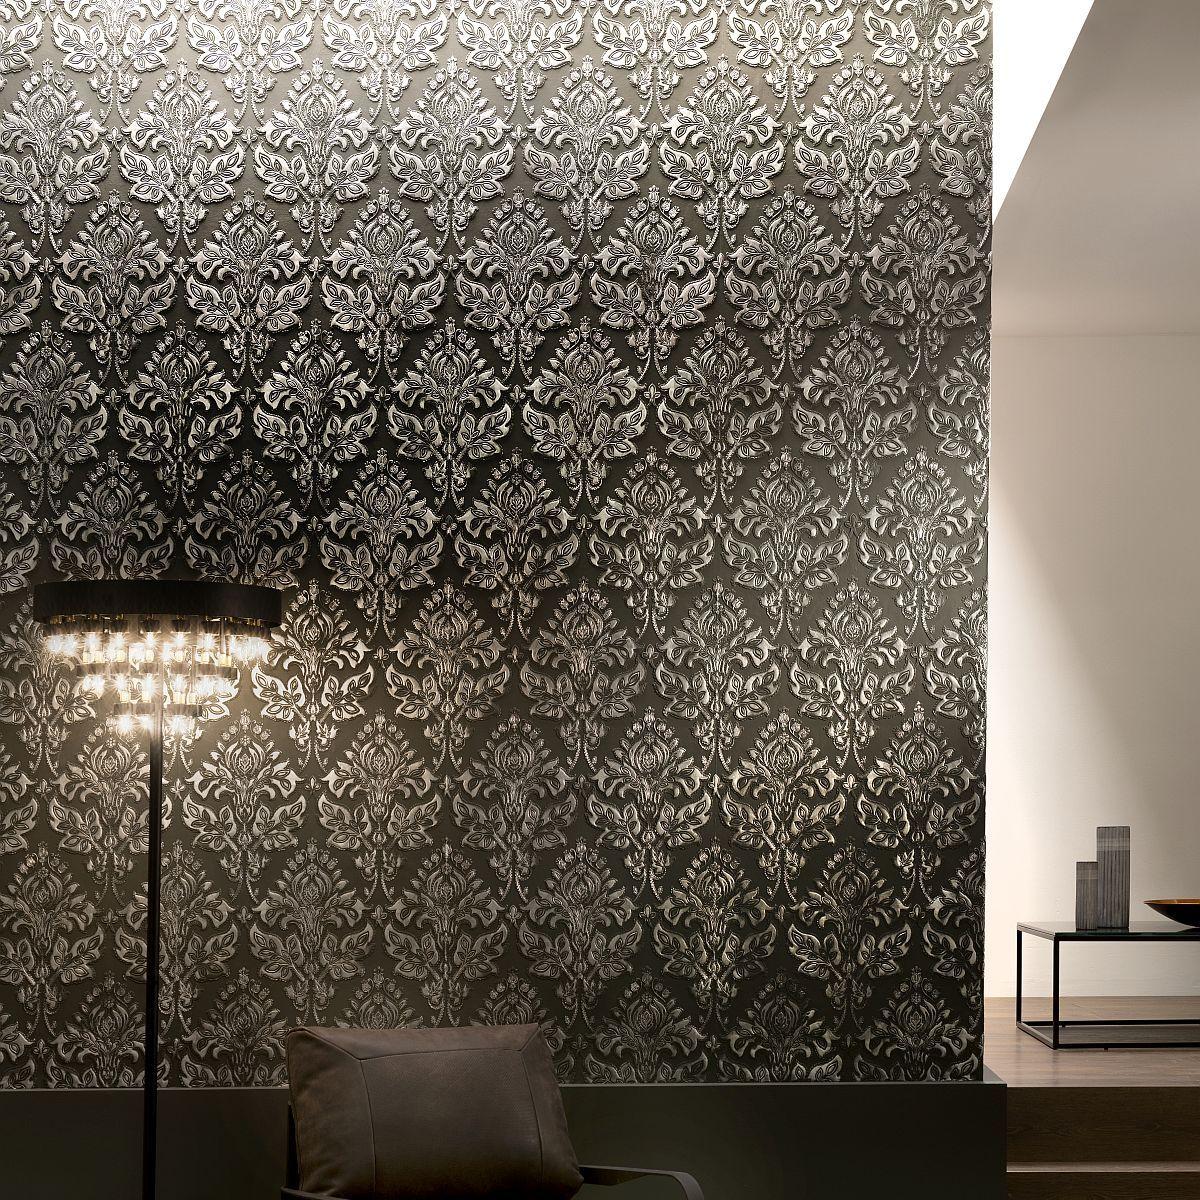 hochwertige tapeten und stoffe lincrusta tapestry rd1972. Black Bedroom Furniture Sets. Home Design Ideas